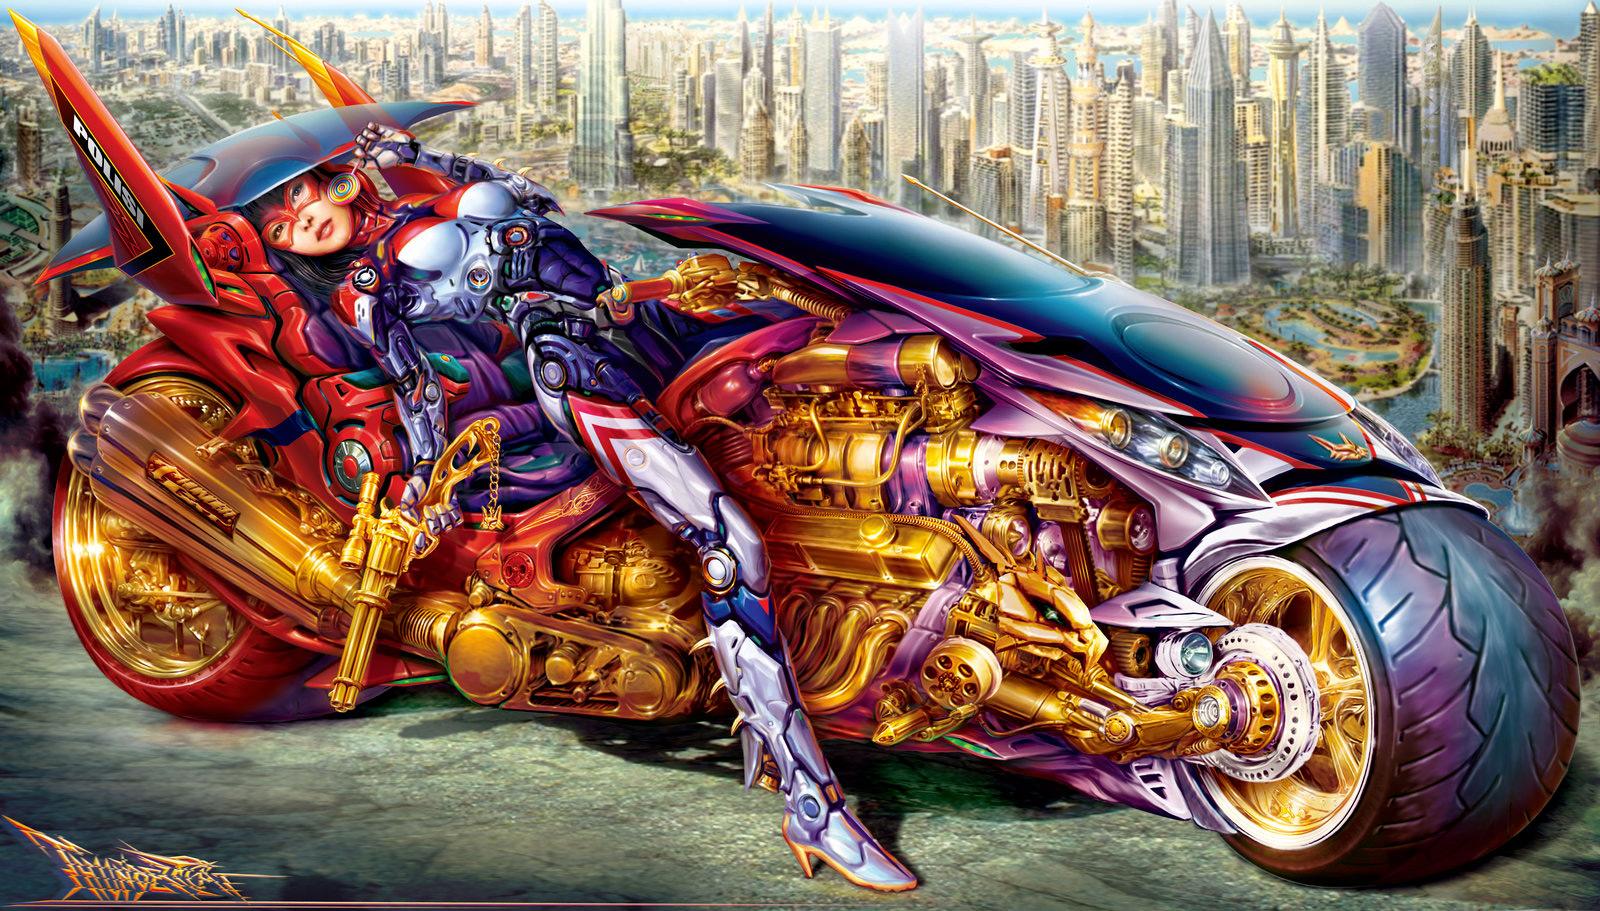 Sci fi art sricandy sabrecat